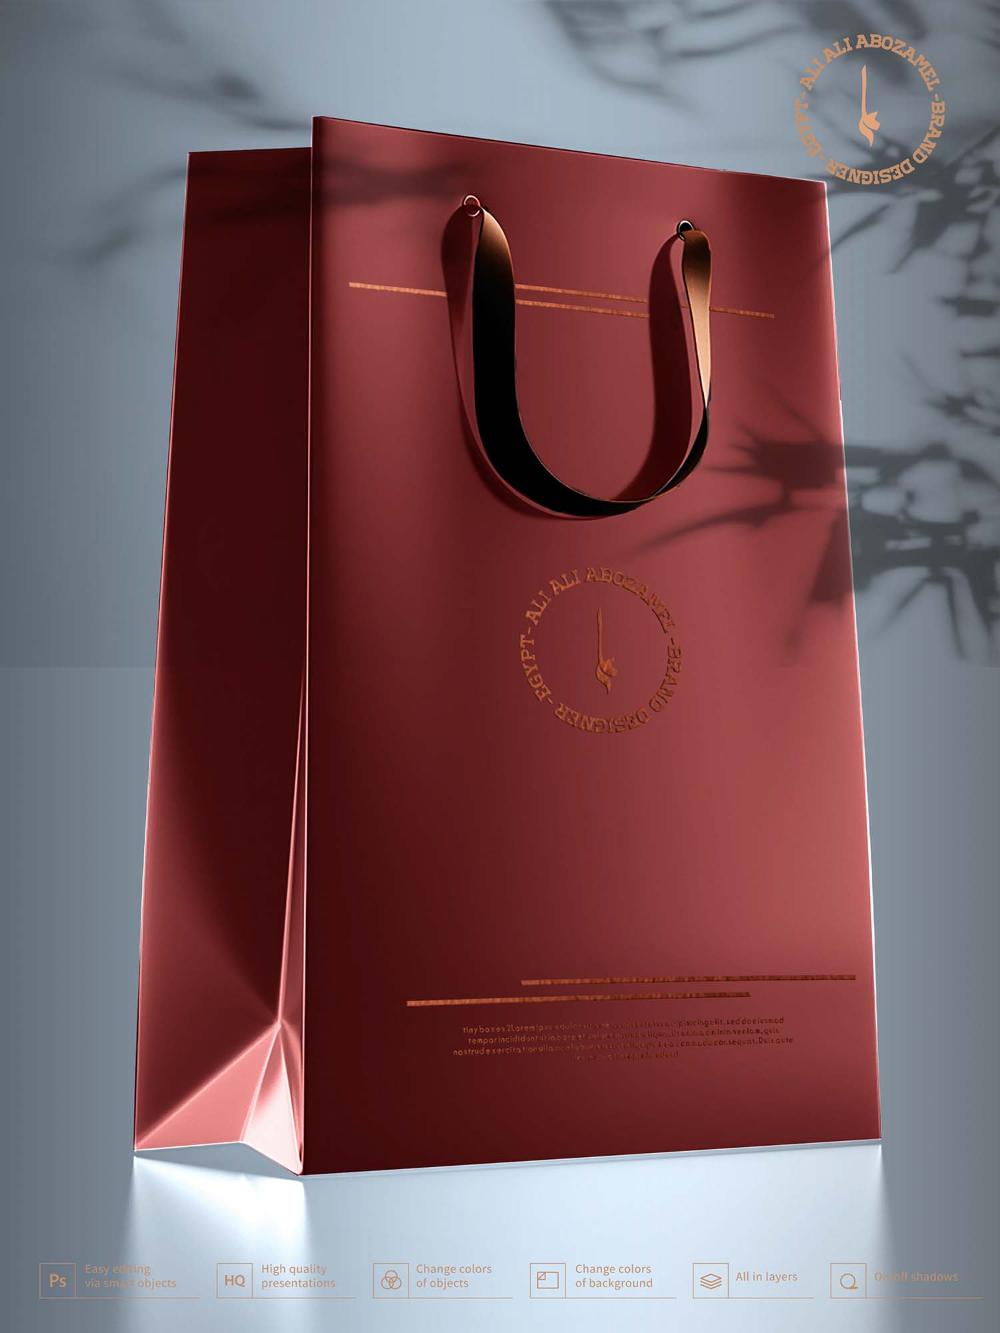 Download Free Black Bag Box With Label Mockup Psd In 2020 Black Bag Bags Free Black